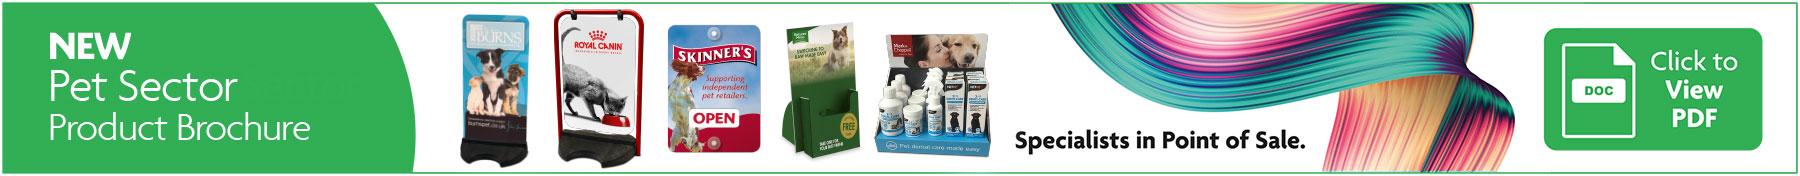 Pet Sector Brochure BD&H